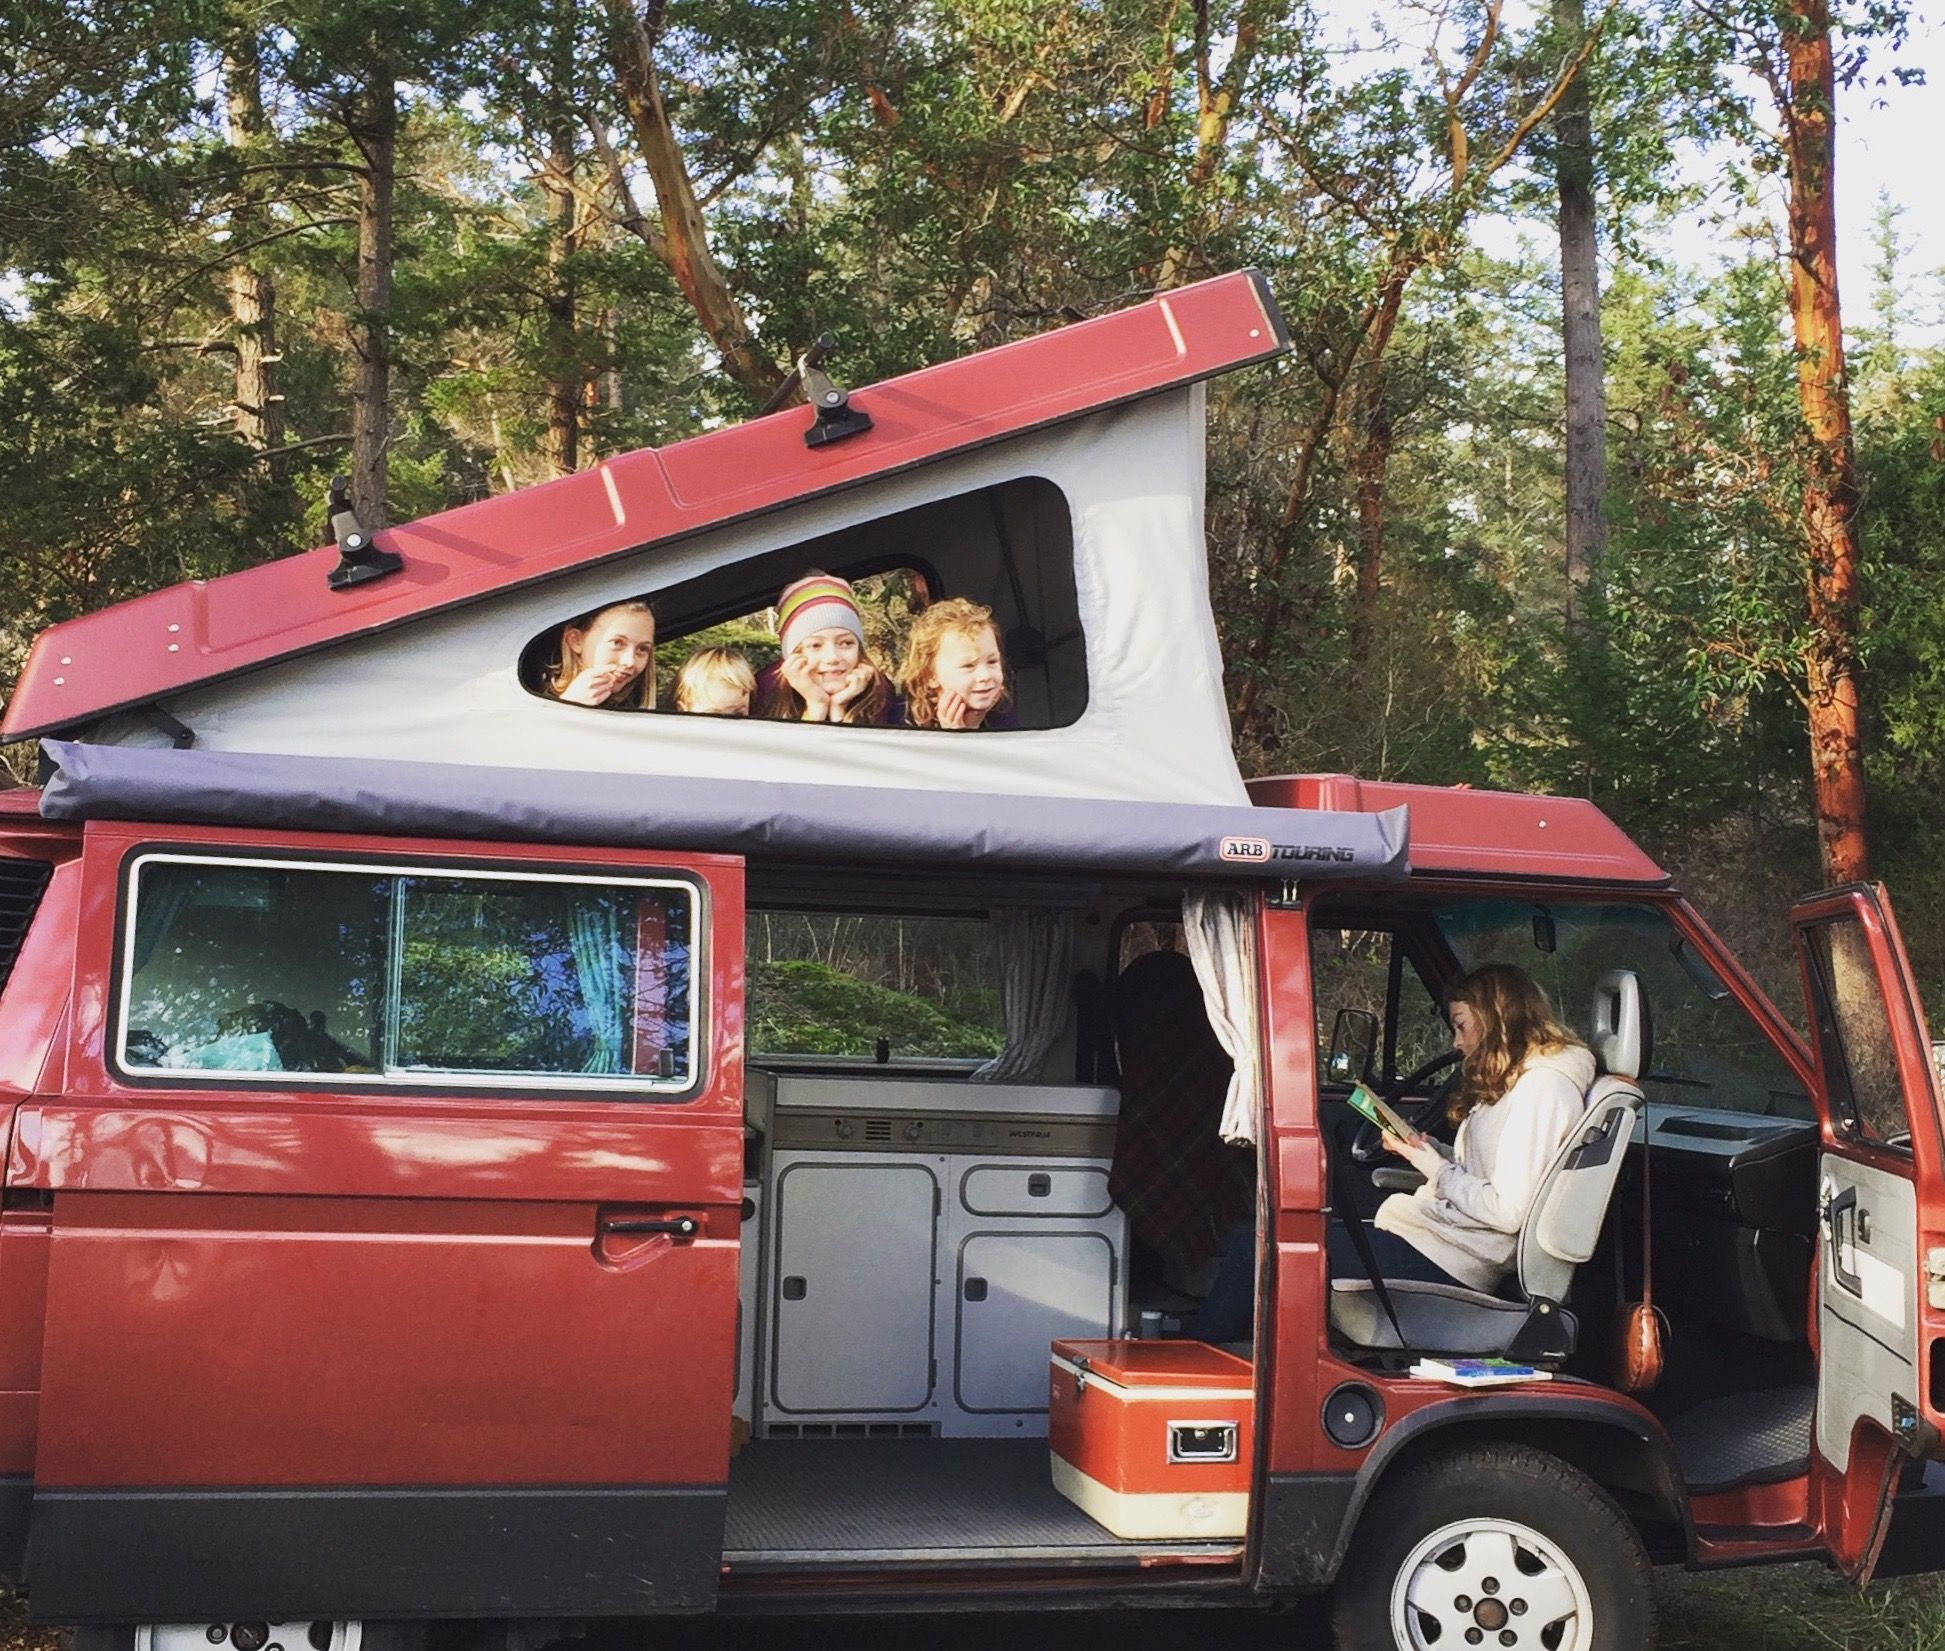 Peace Vans Rentals Provides All The Fun Of Camping Minus The Hassle Camper Rental Minivan Camping Camper Van